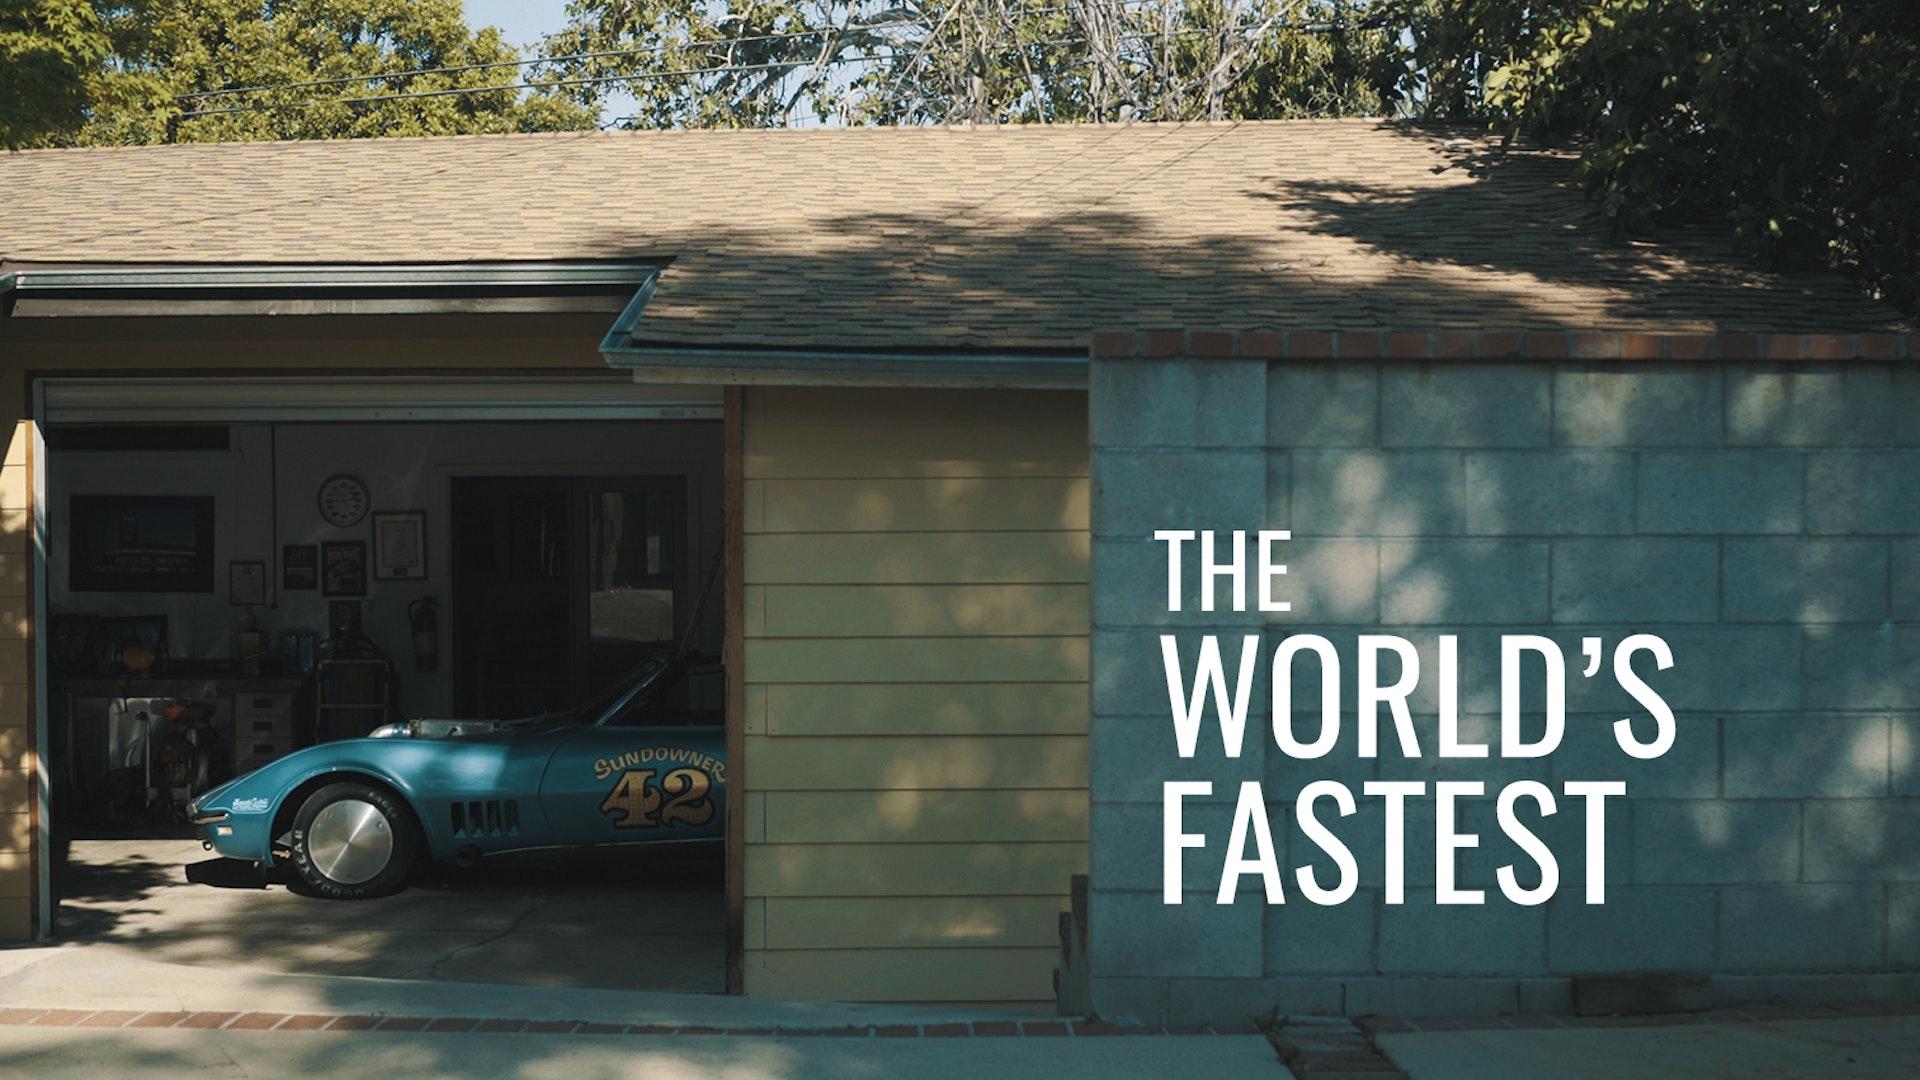 THE WORLD'S FASTEST TRAILER